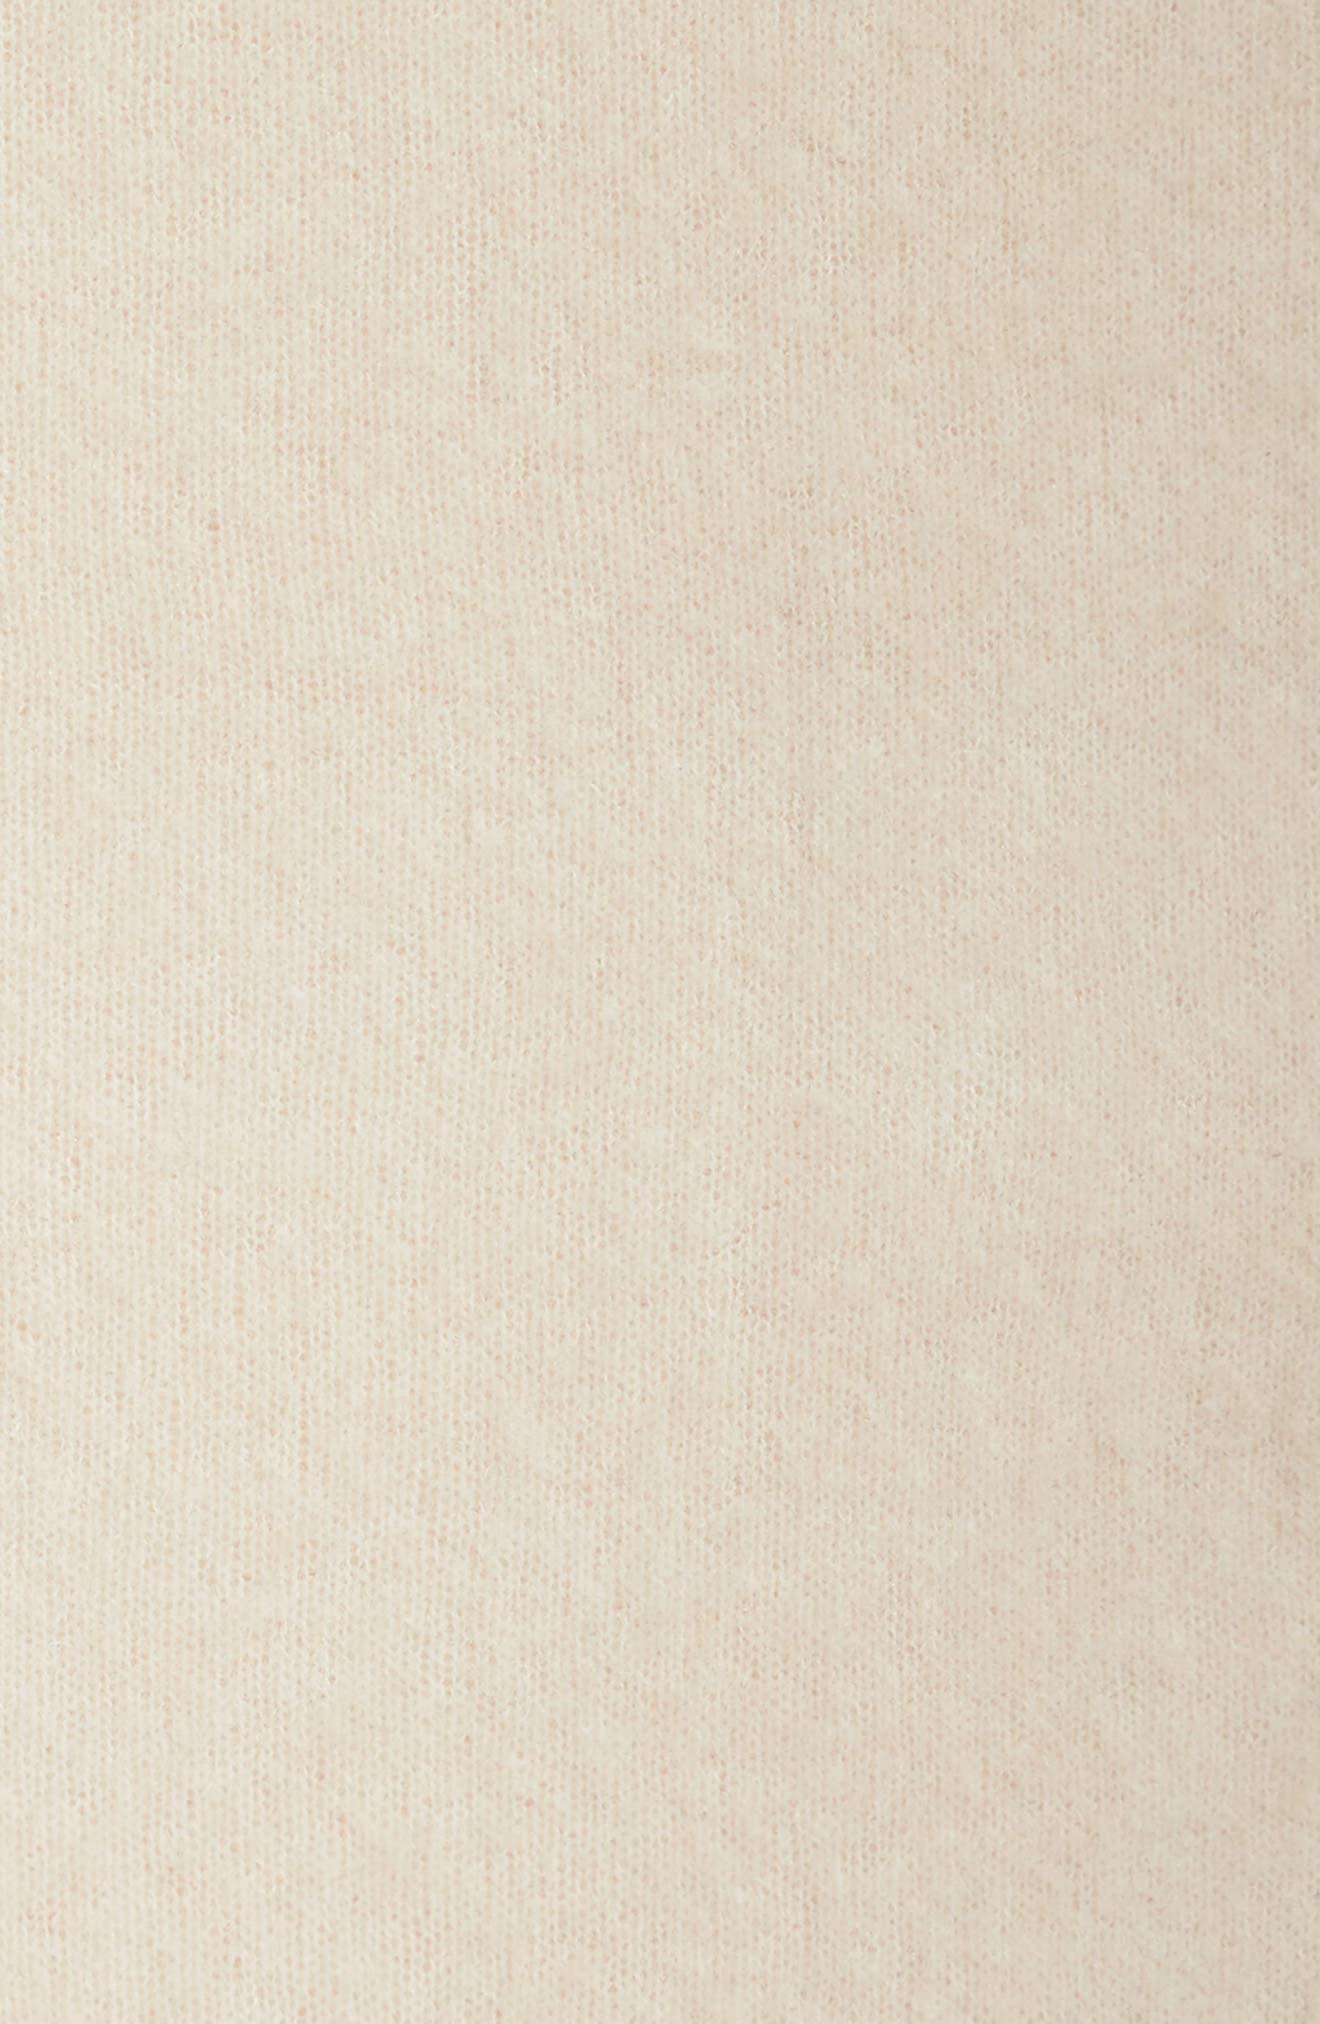 Cashmere Blend Cowl Scarf,                             Alternate thumbnail 4, color,                             Soft White